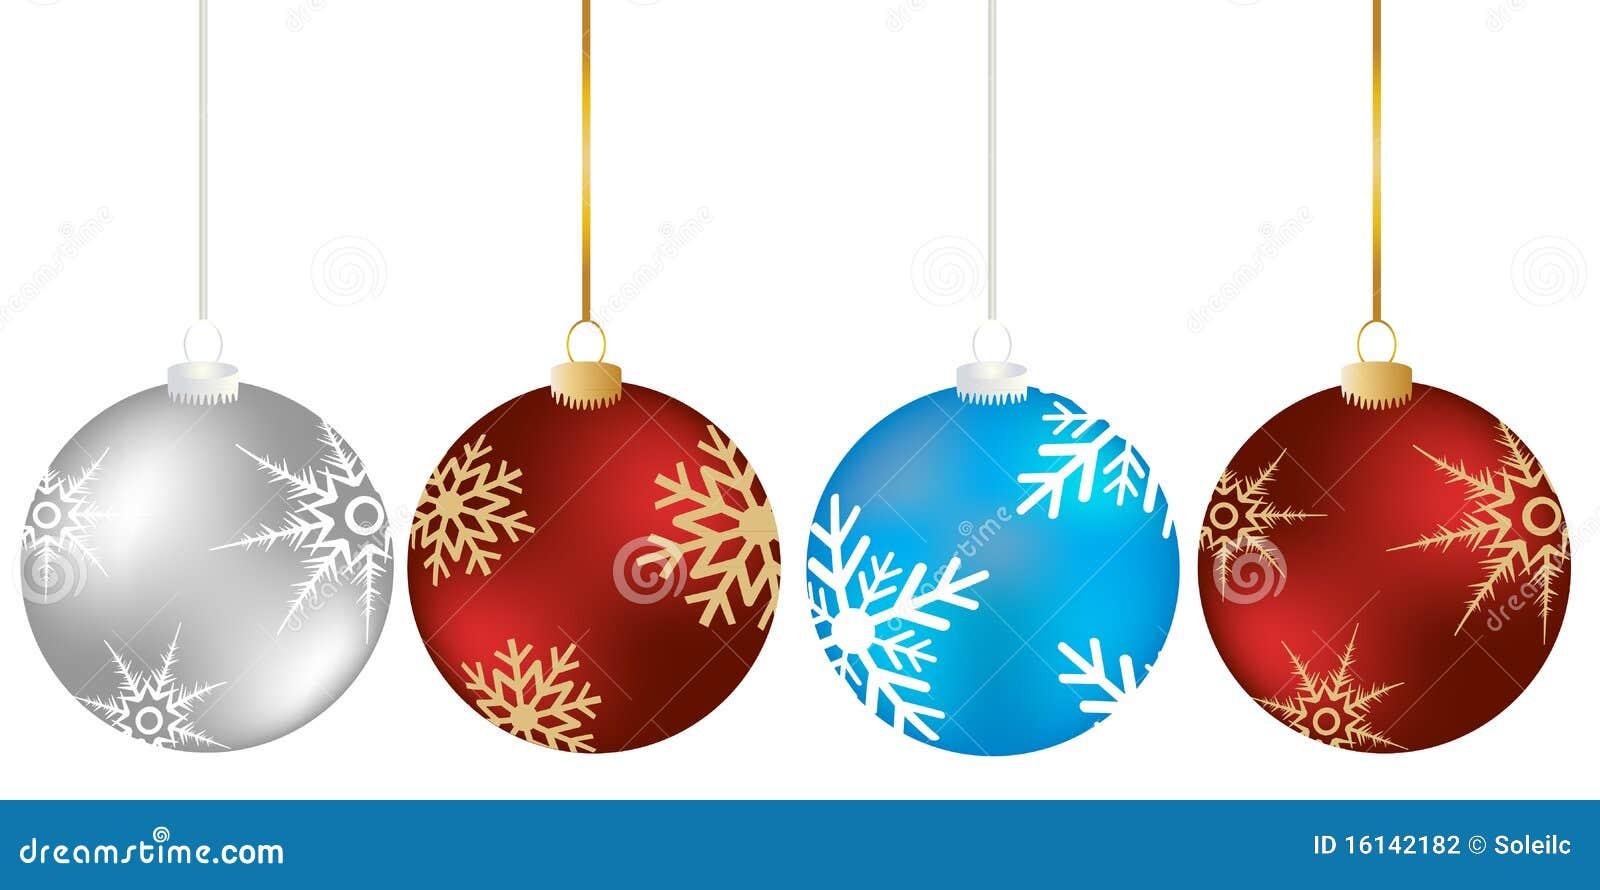 Christmas ornaments stock photography image 16142182